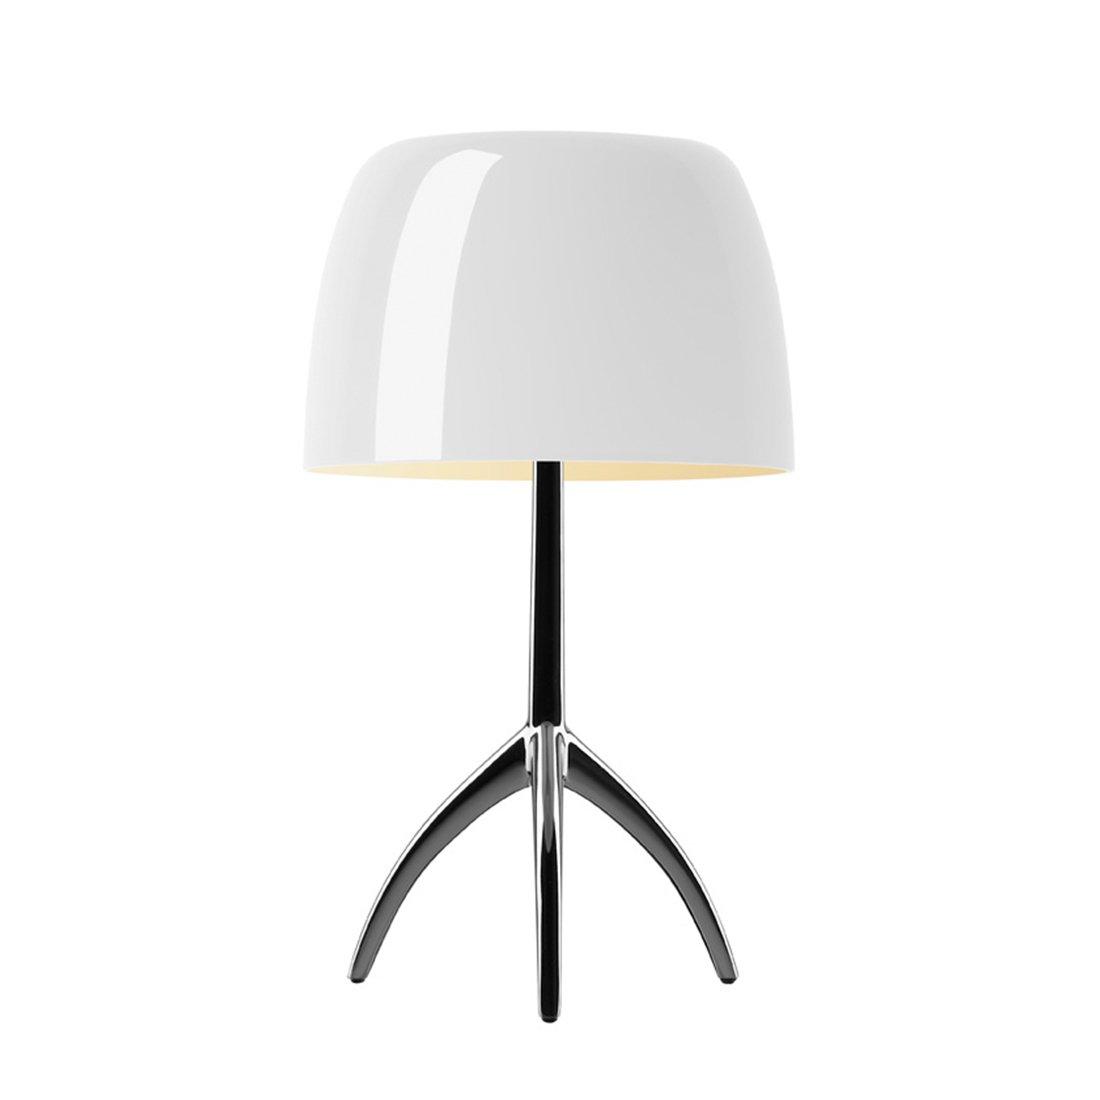 Foscarini Lumiere Piccola Tafellamp - Warm Wit - Zwart Chroom